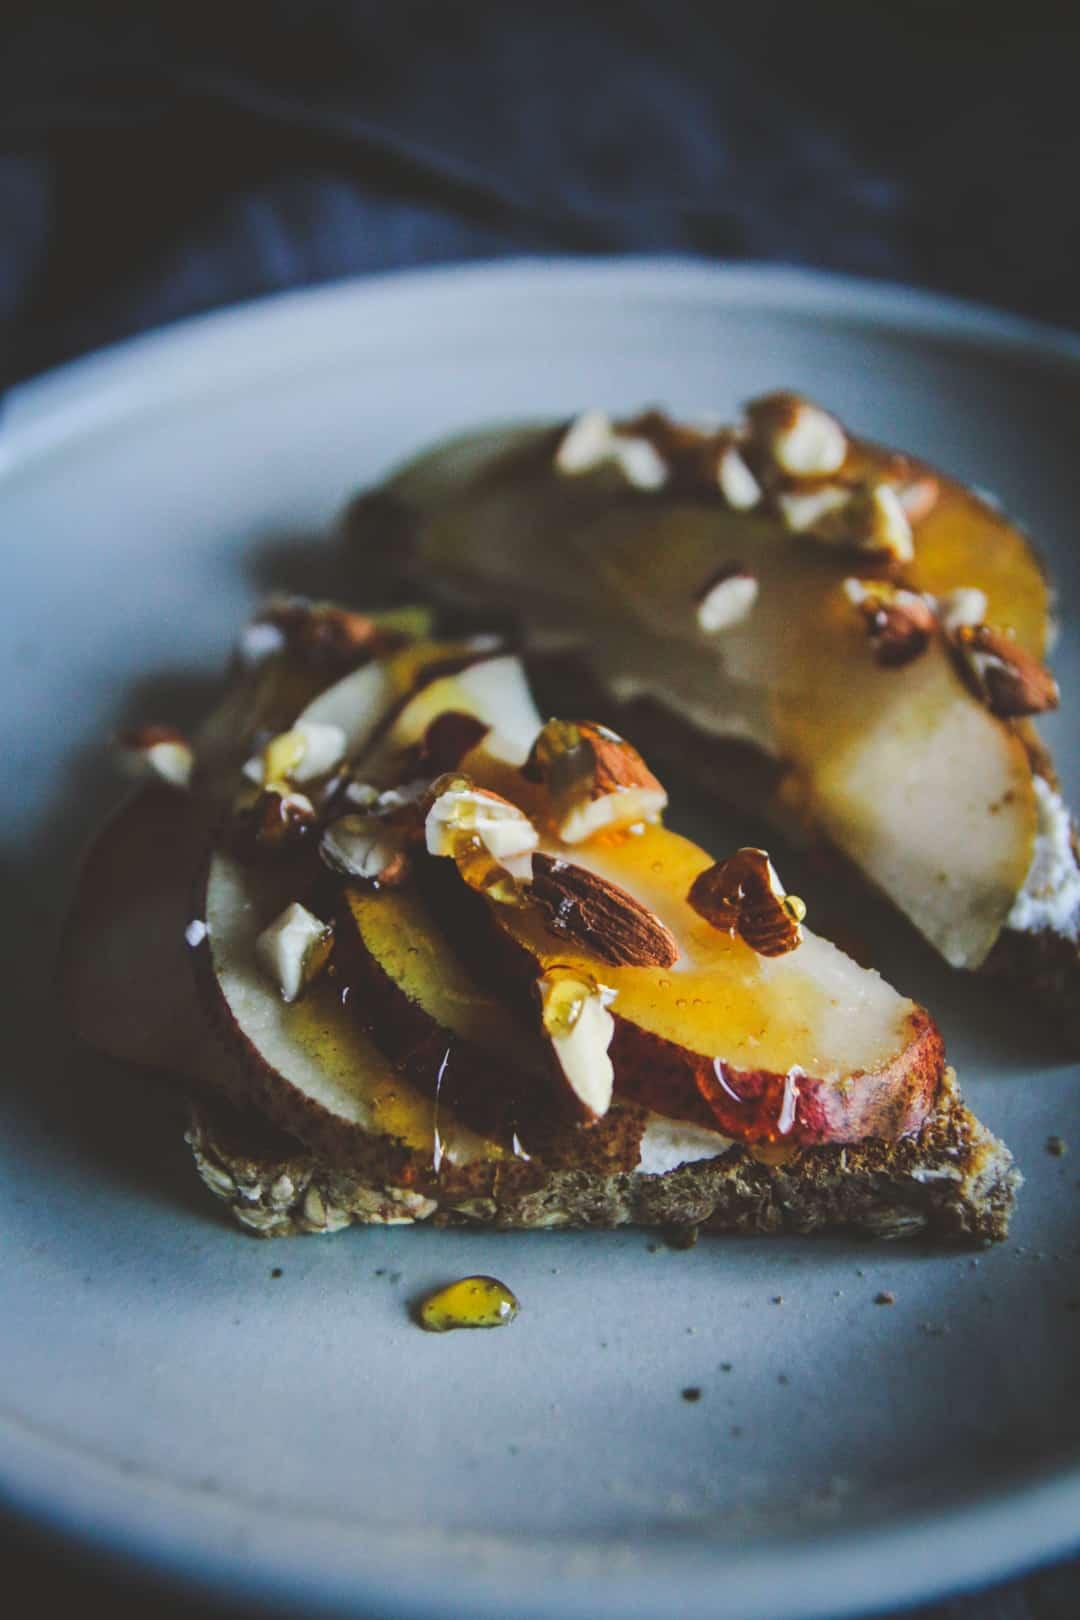 Ricotta honey pear toast recipe - delicious and nutritious breakfast toast recipe